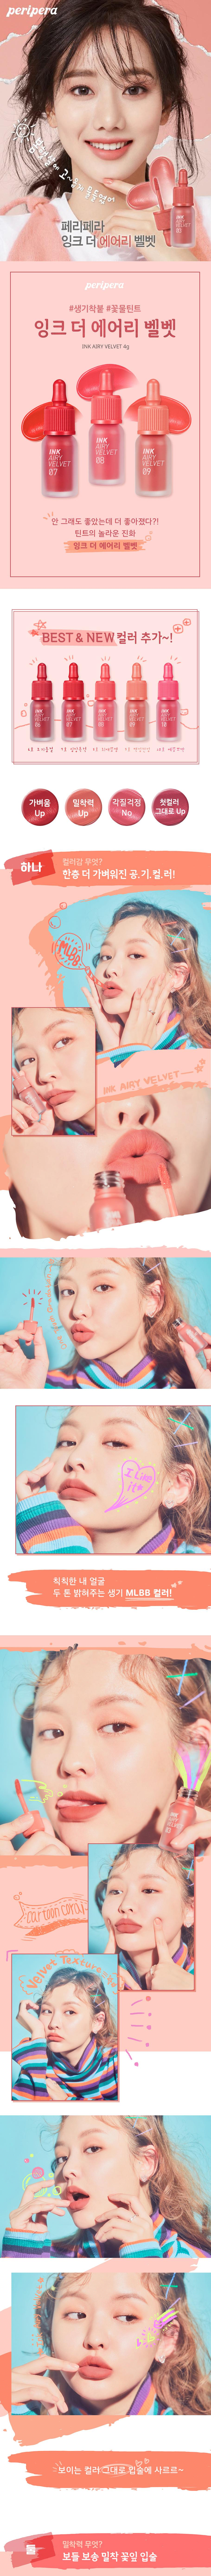 [ShiPAPA] Peripera | 19S/S Ink Airy Velvet| 韓國直送🇰🇷 | 香港 澳門